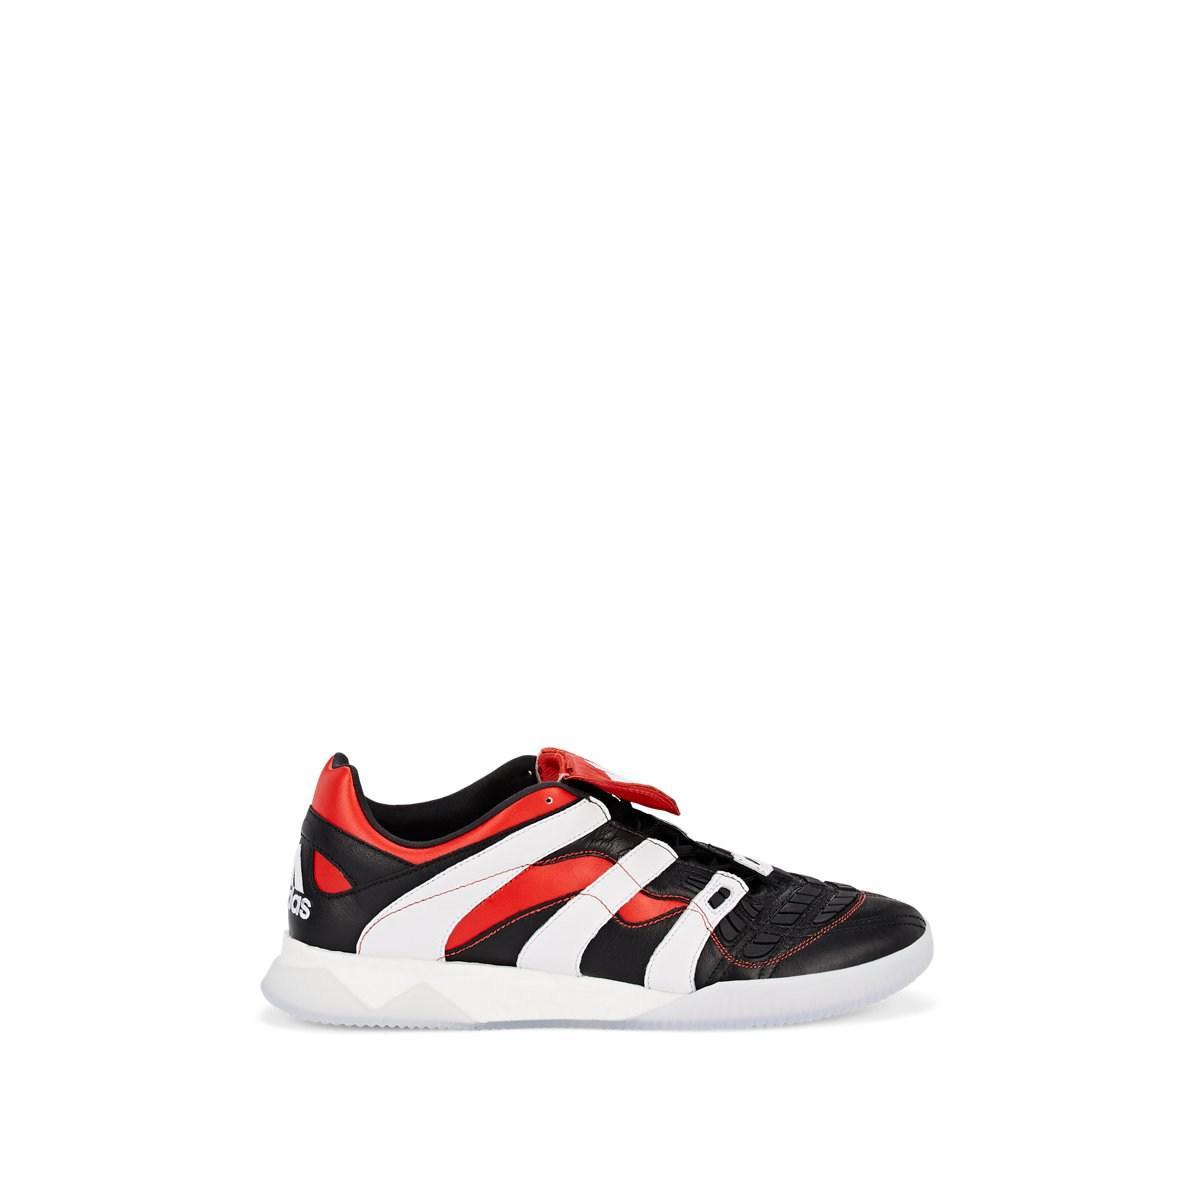 cb87e67c3b1a Lyst - Adidas Predator Accelerator Tr Sneakers in Black for Men